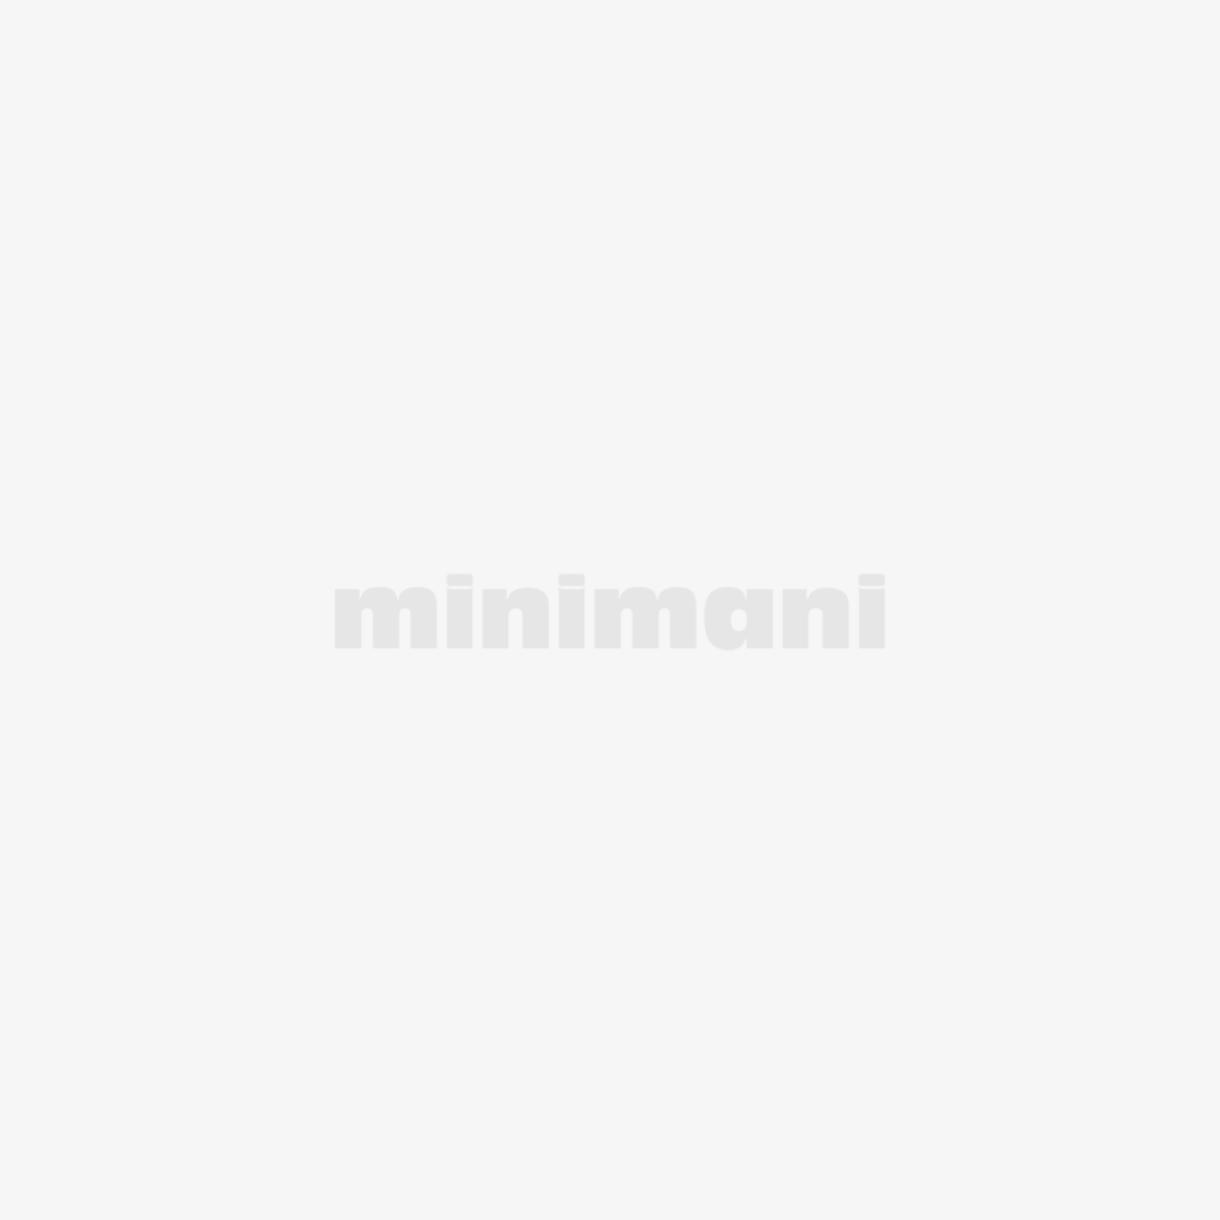 TY TASHA - PINK/GREY LEOPARD CLIP